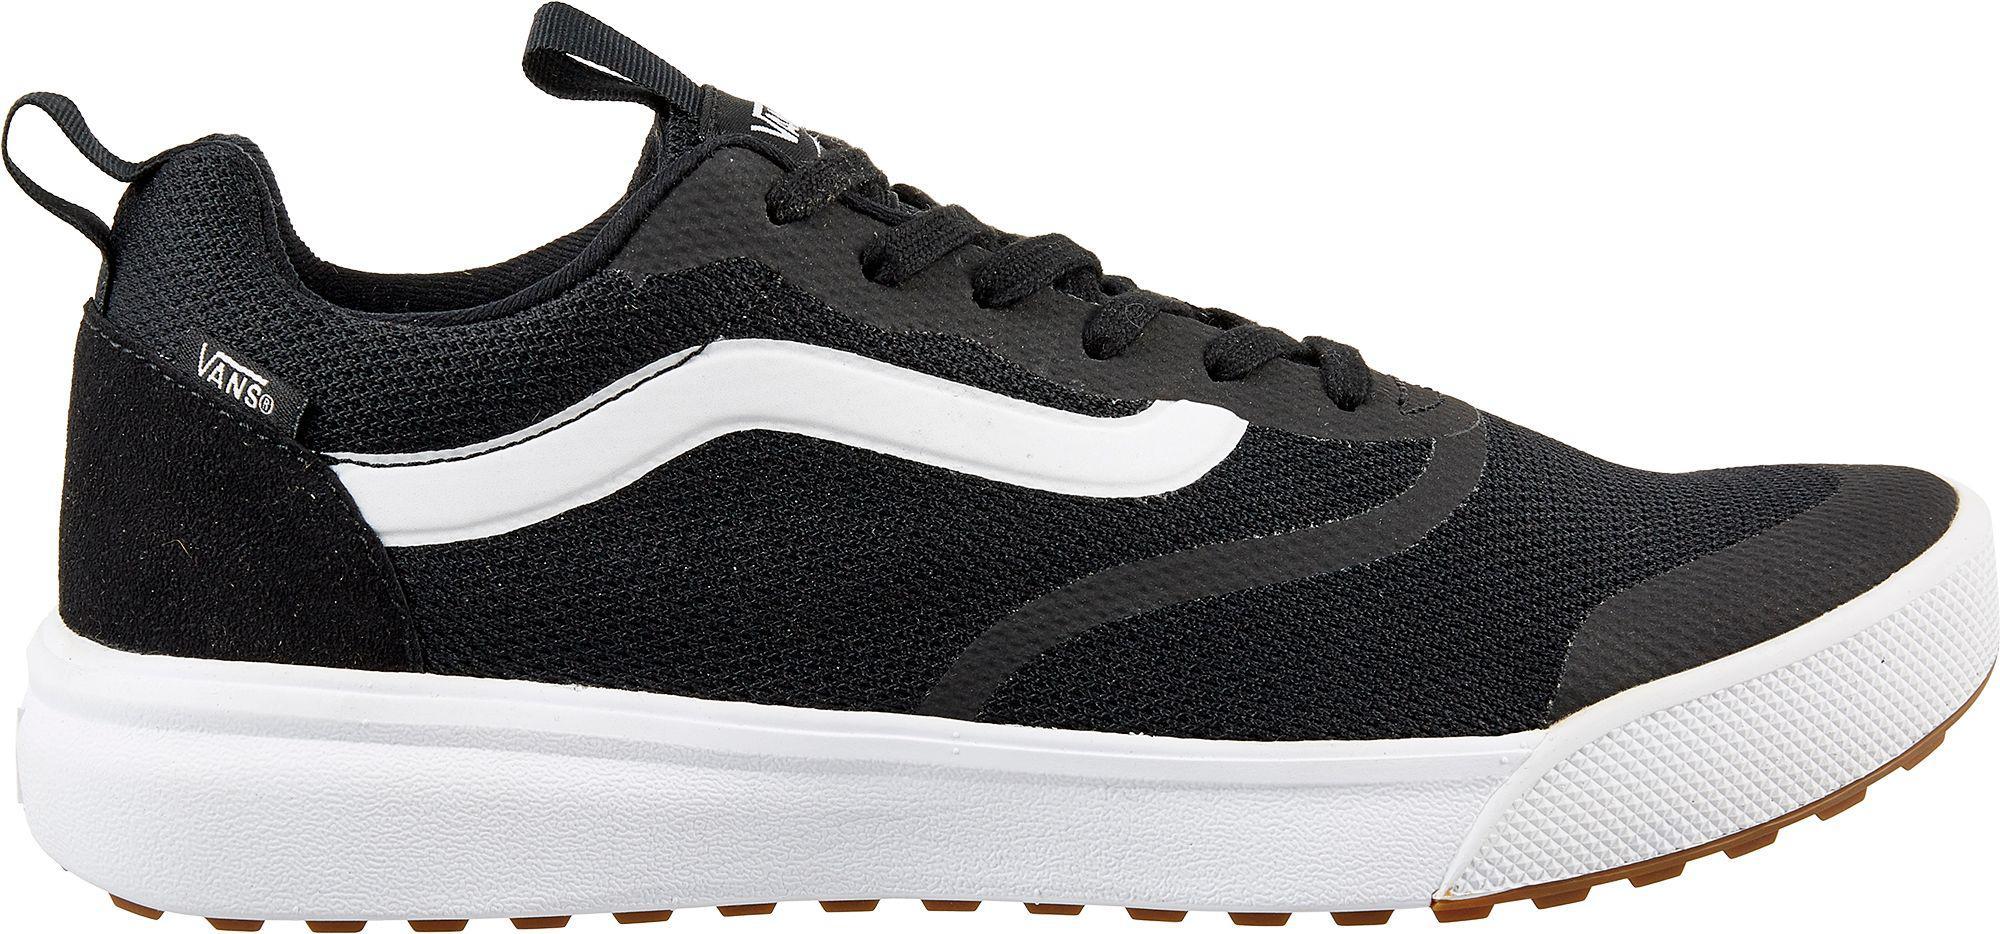 35683cf05bc Lyst - Vans Ultrarange Rapidweld Shoes in Black for Men